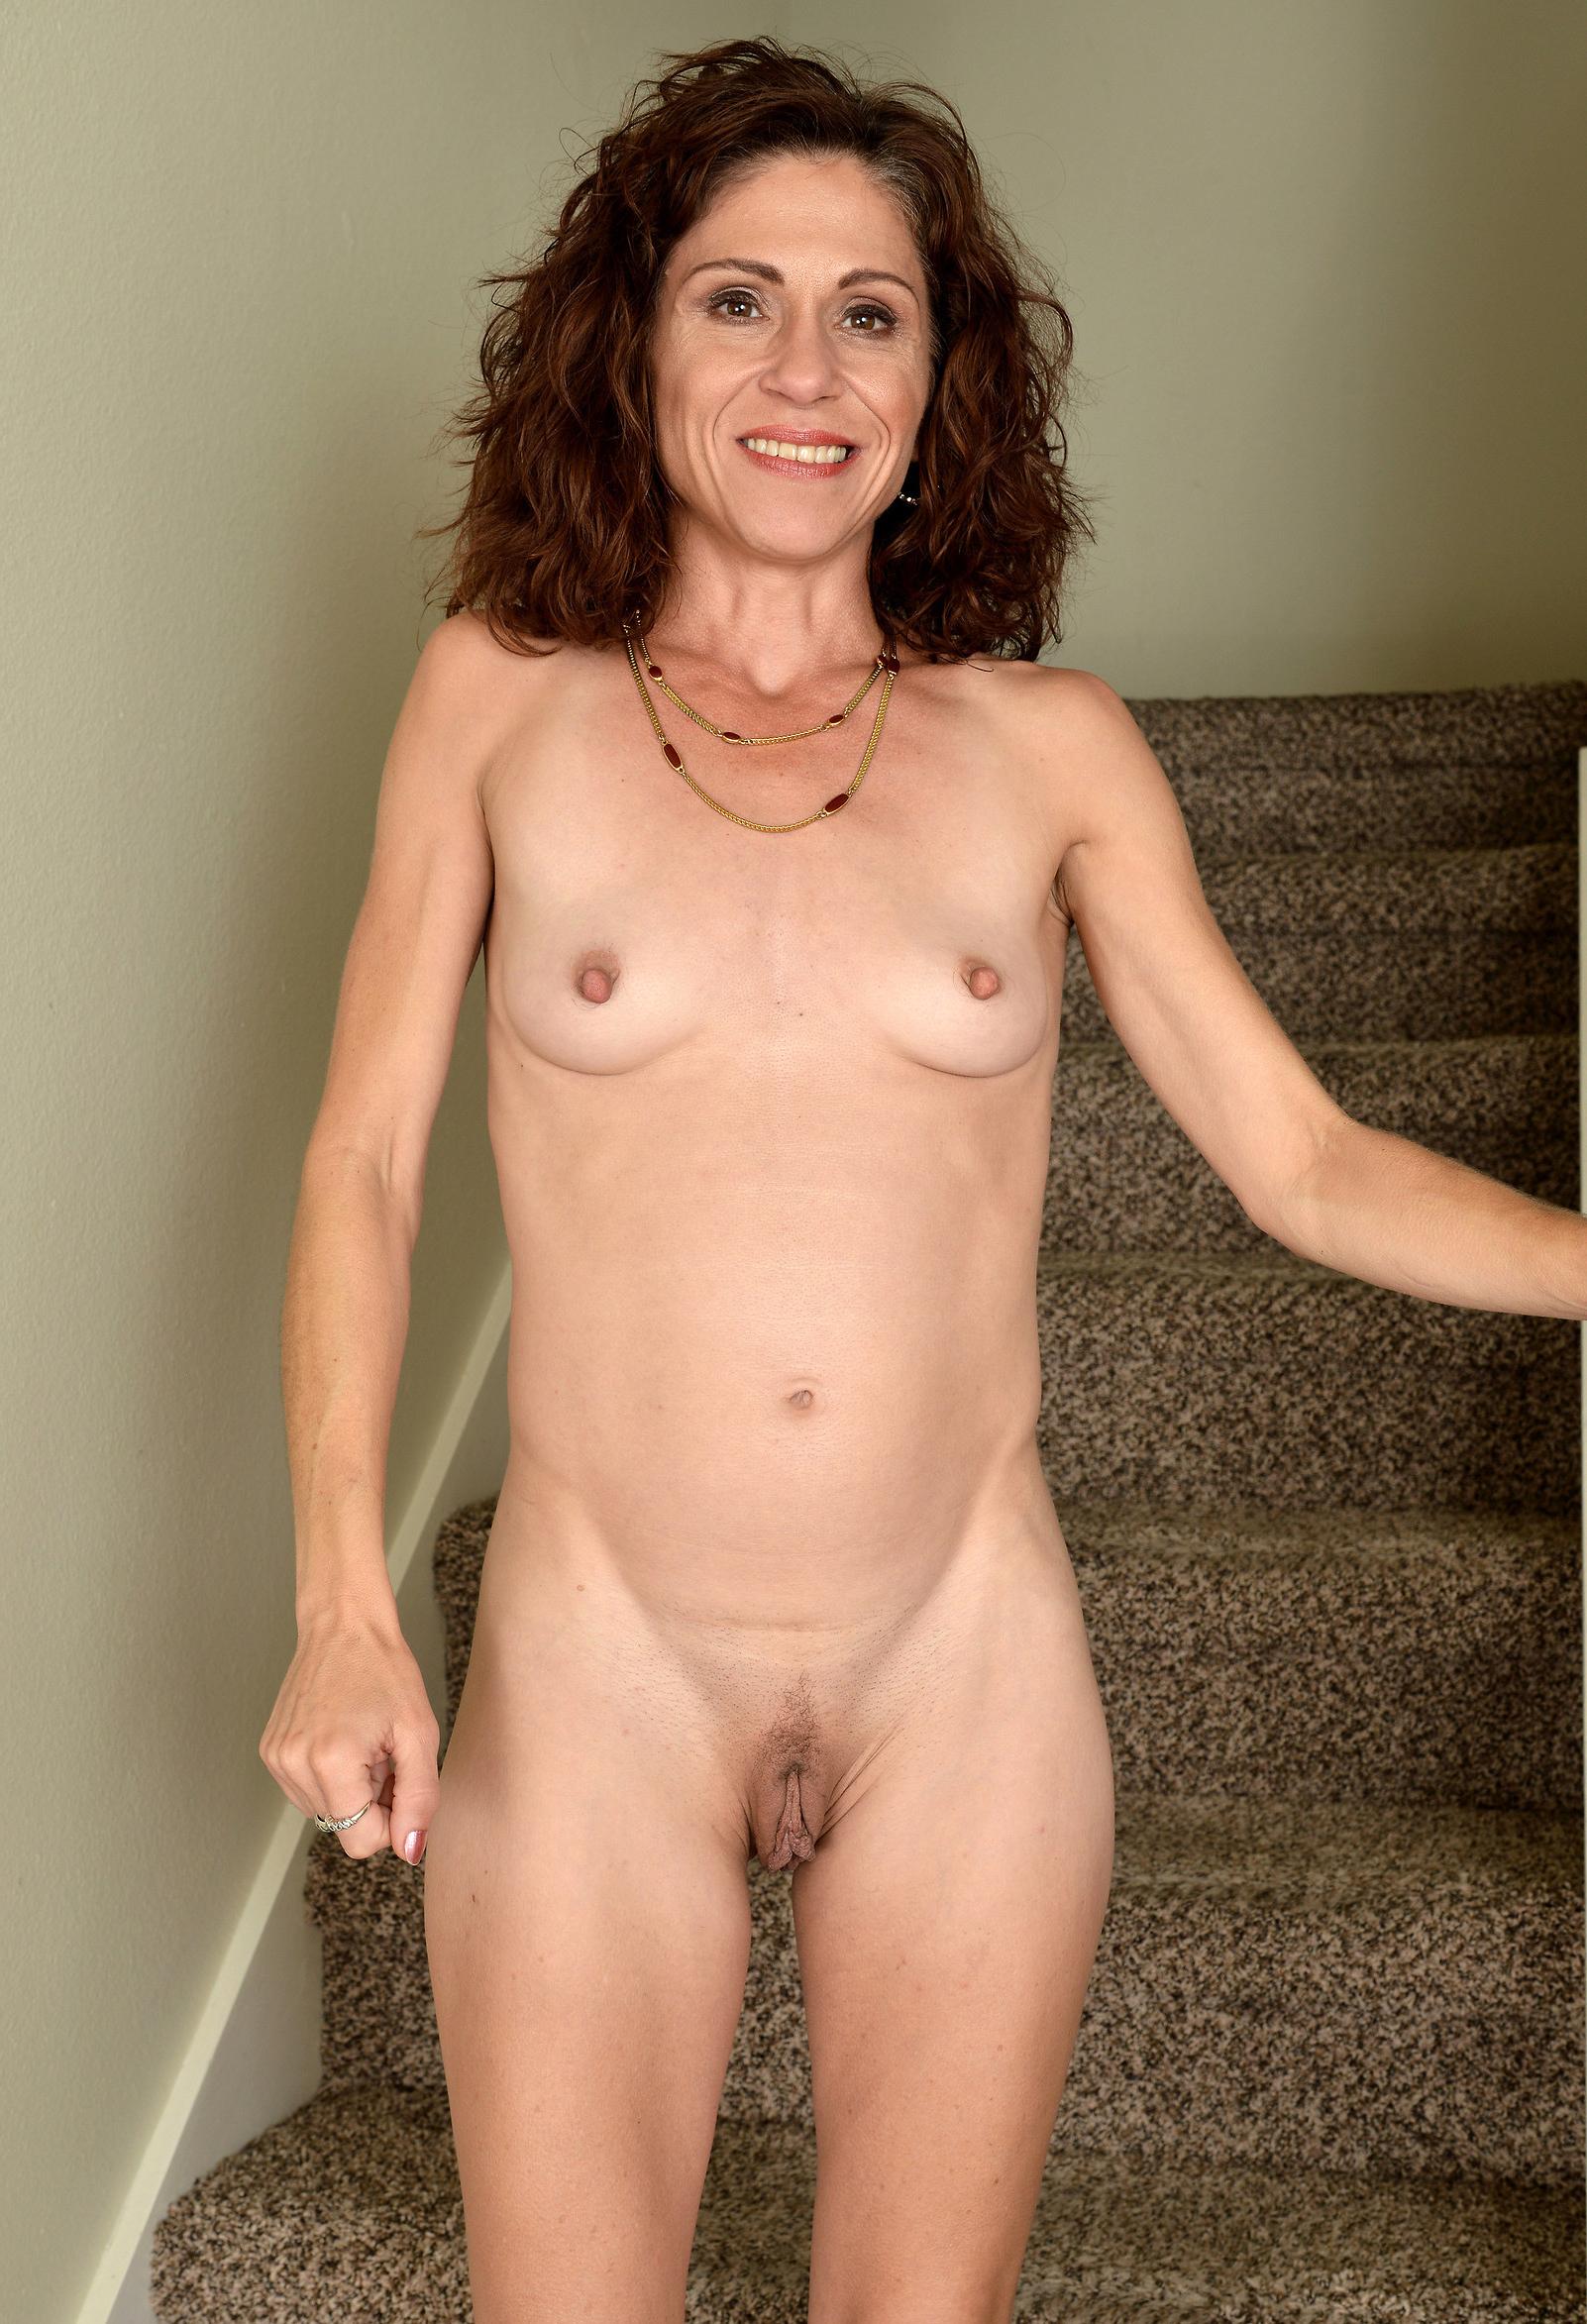 Very skinny nude women